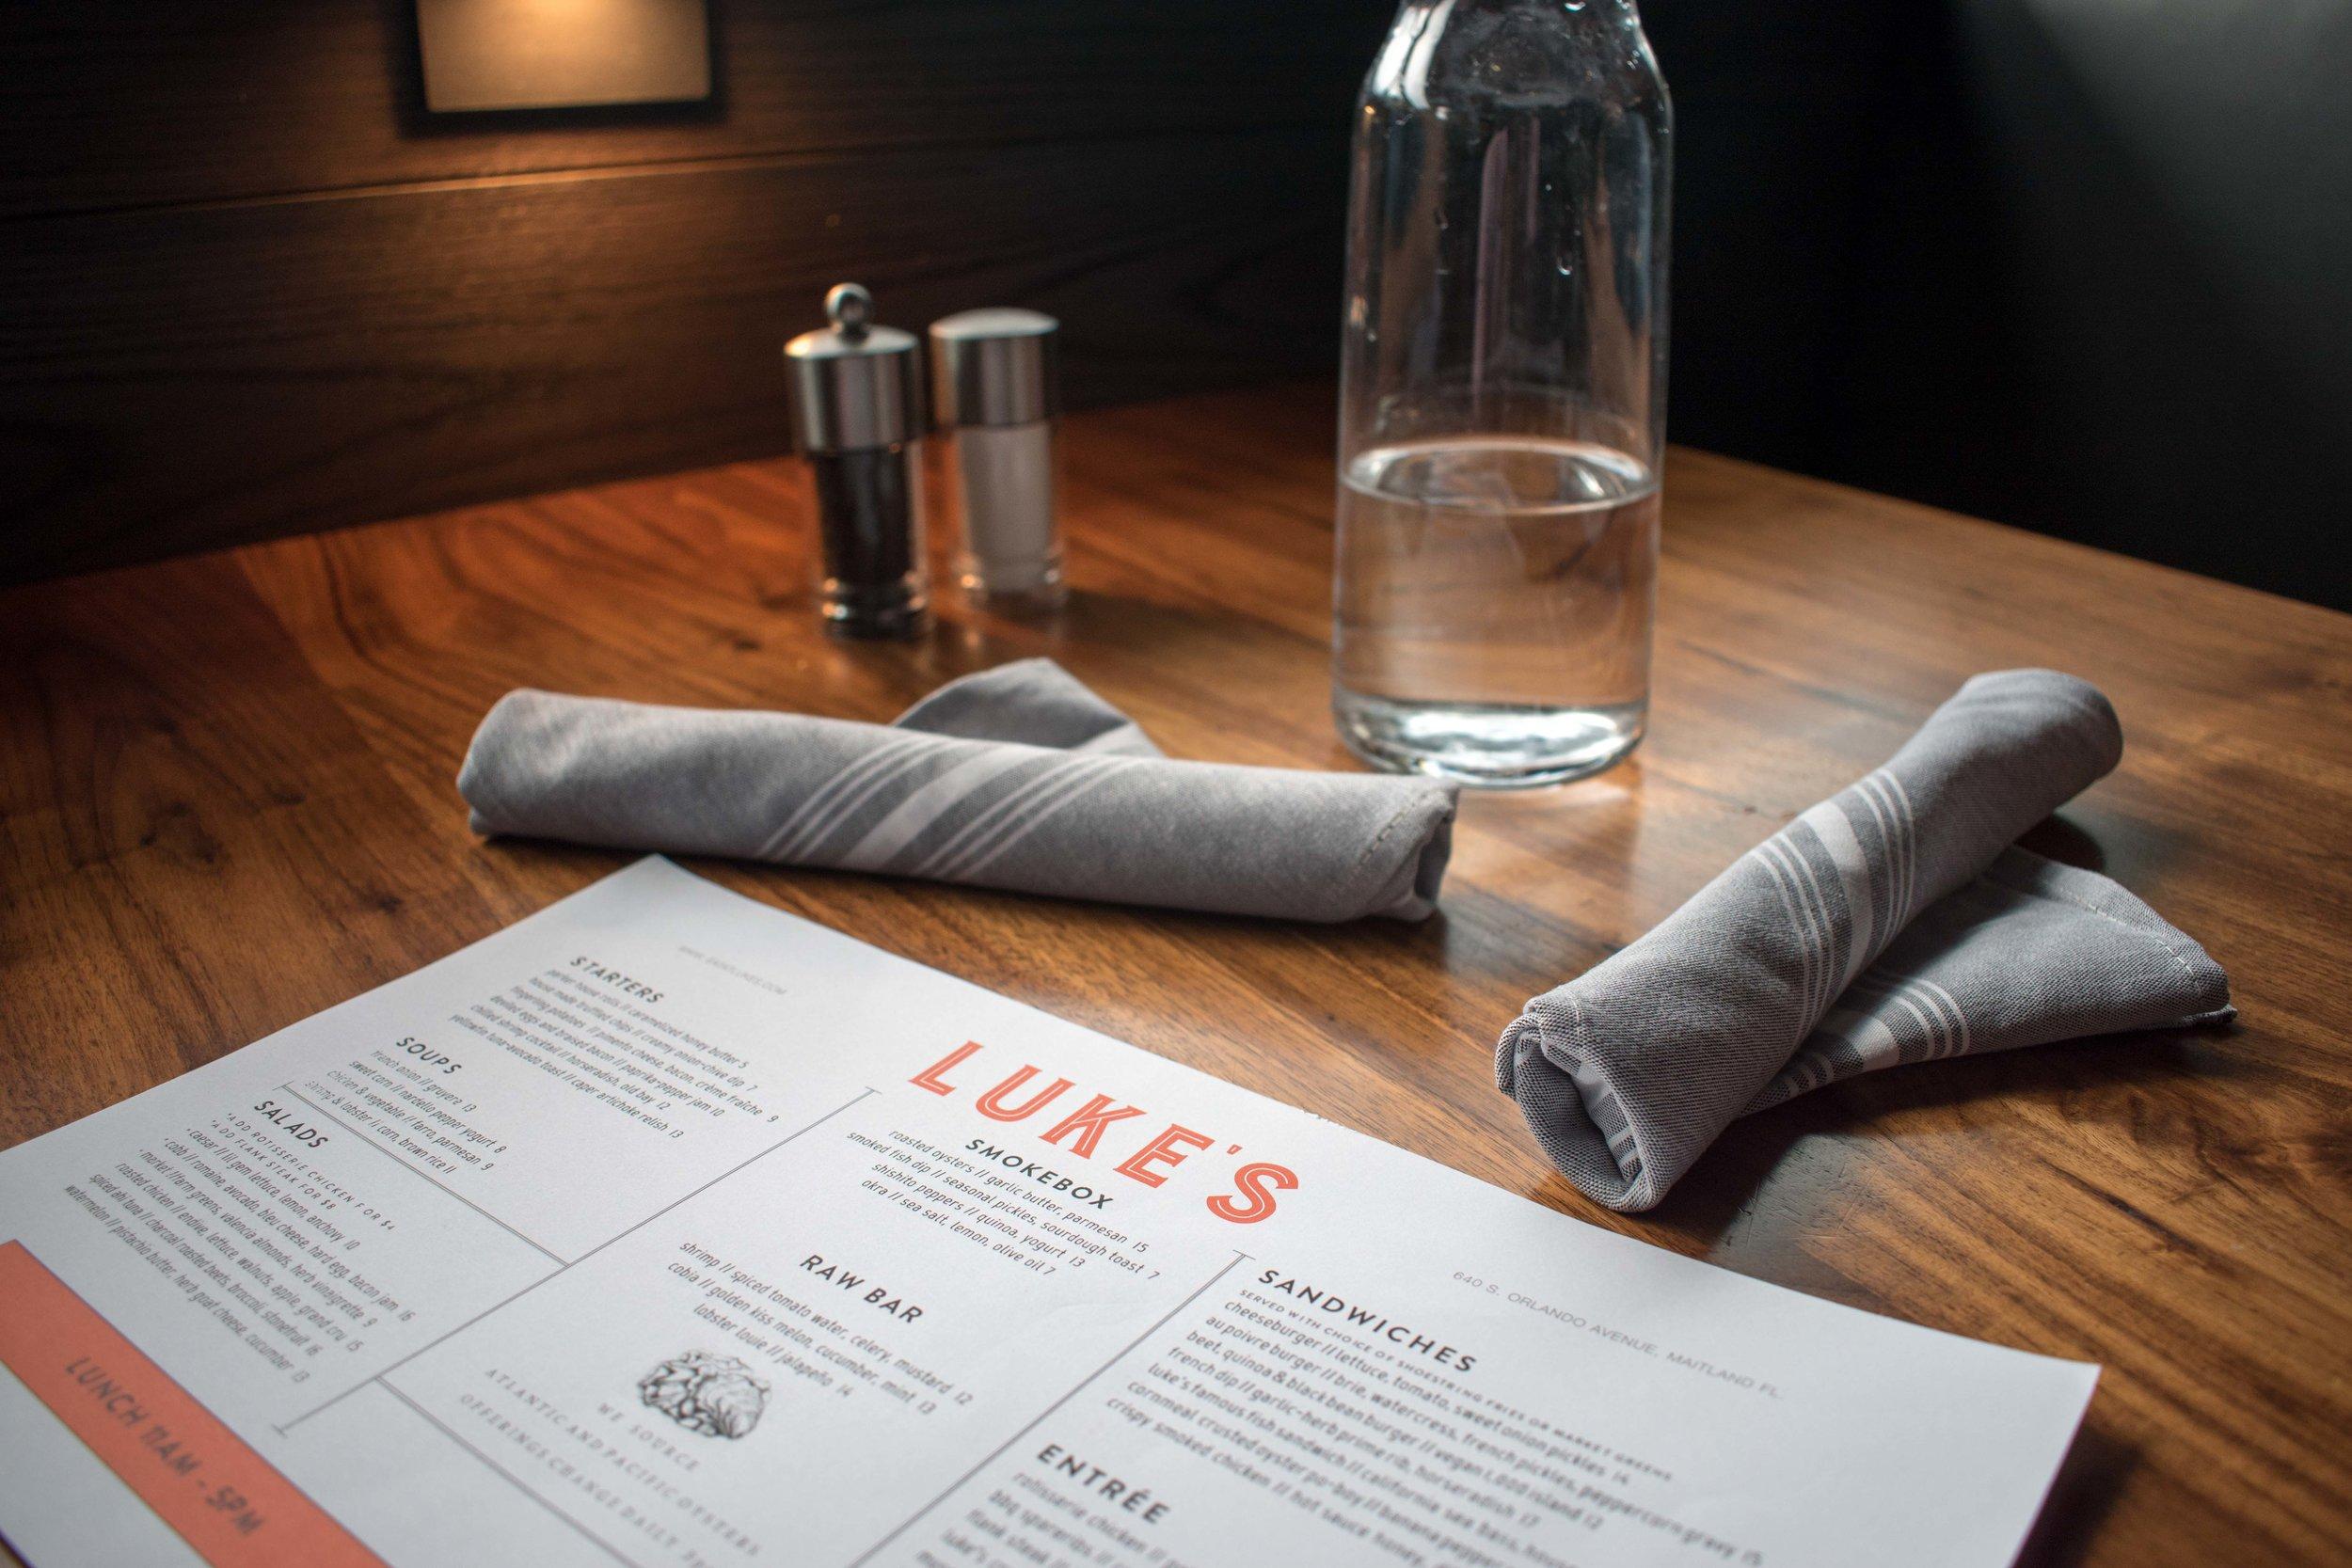 Luke's Kitchen and Bar Menu